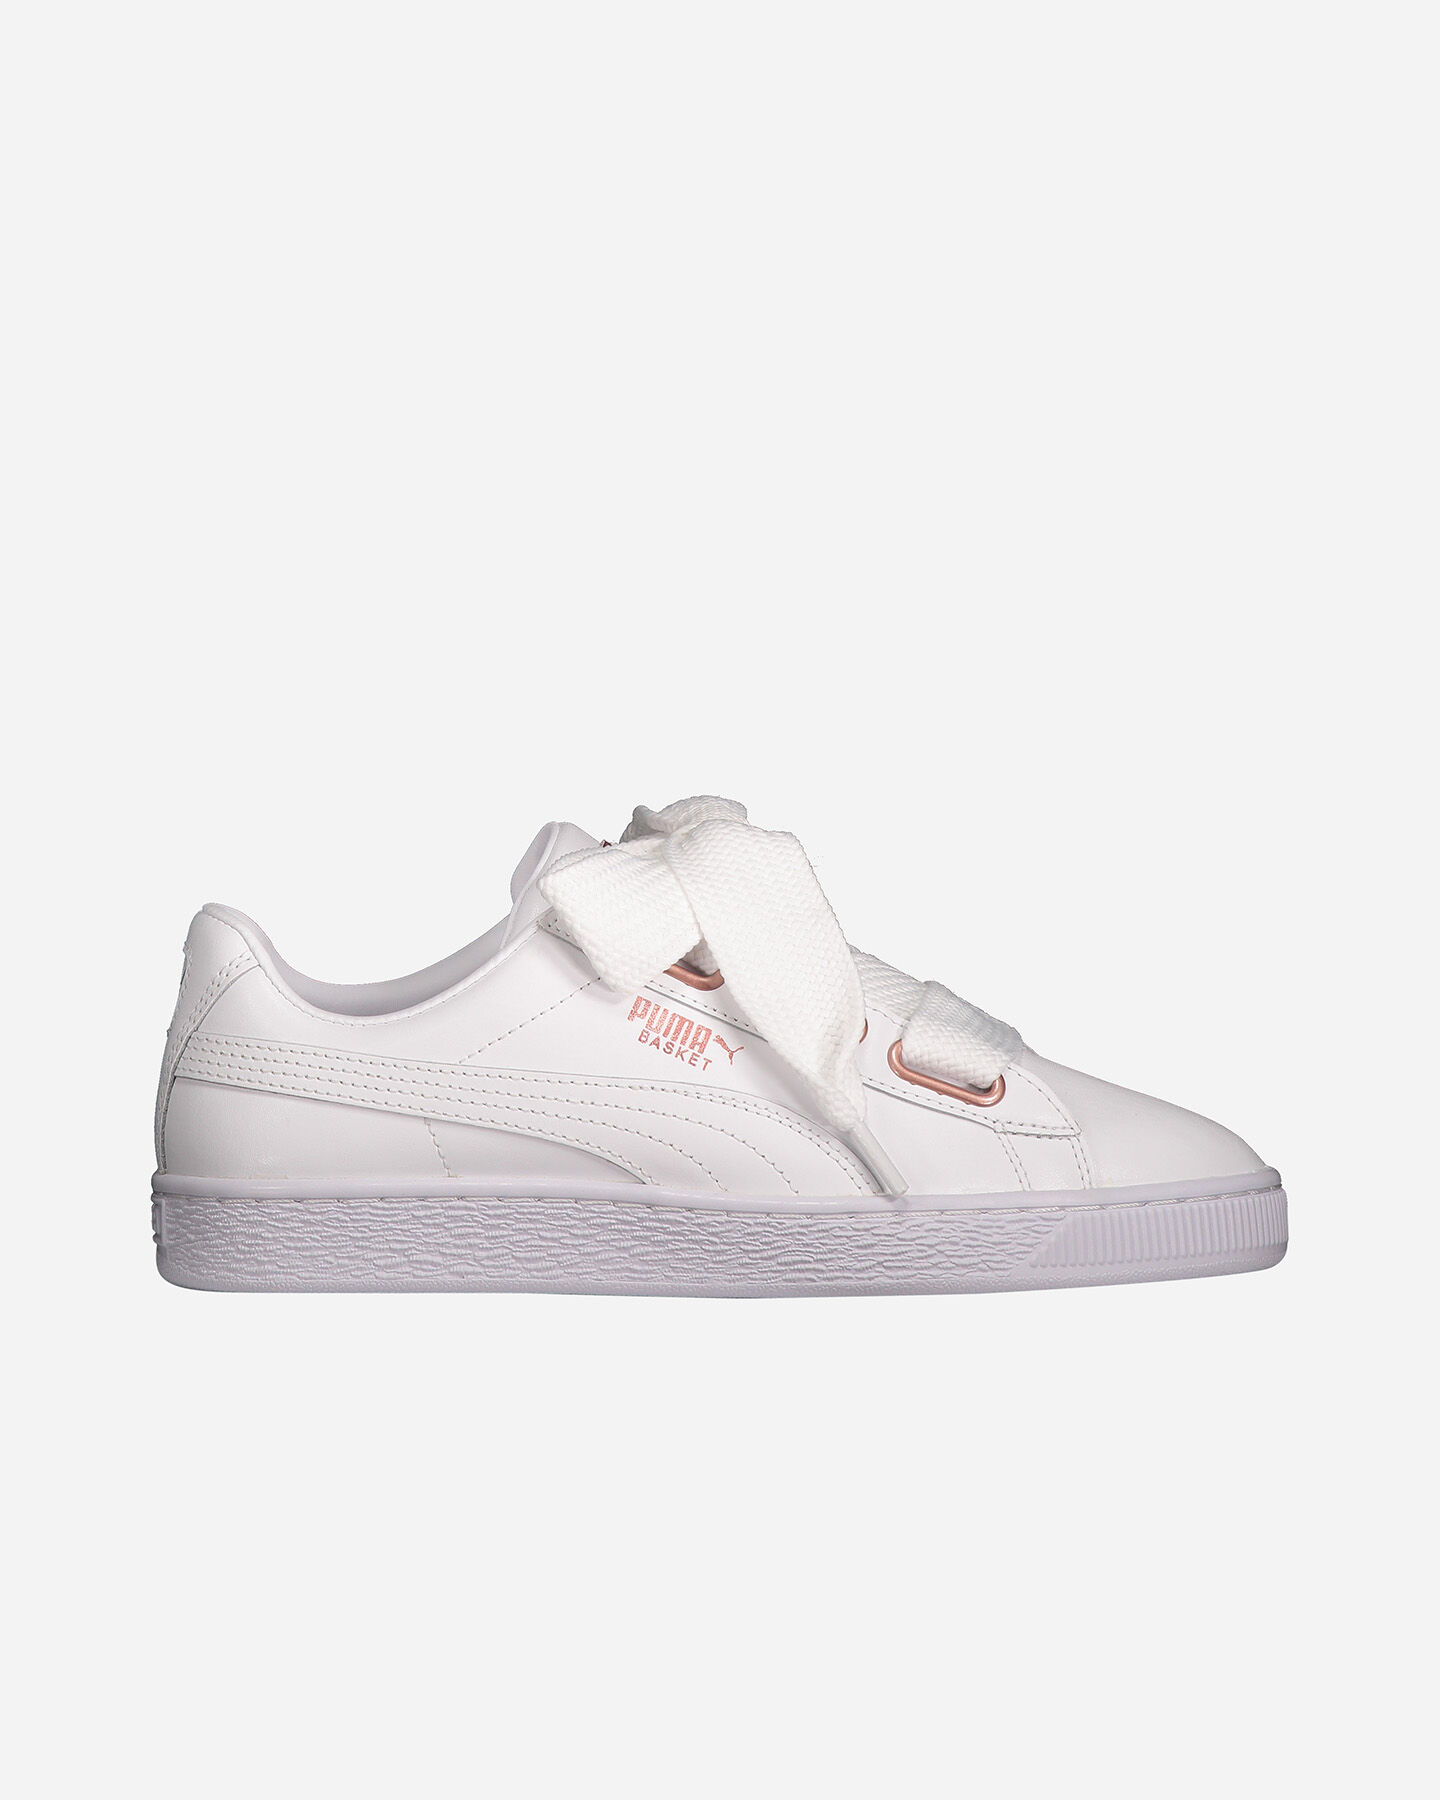 Sneakers Basket Puma 367817 Cisalfa W Gqdwtg Heart 001 Su Leather Scarpe OPk0nw